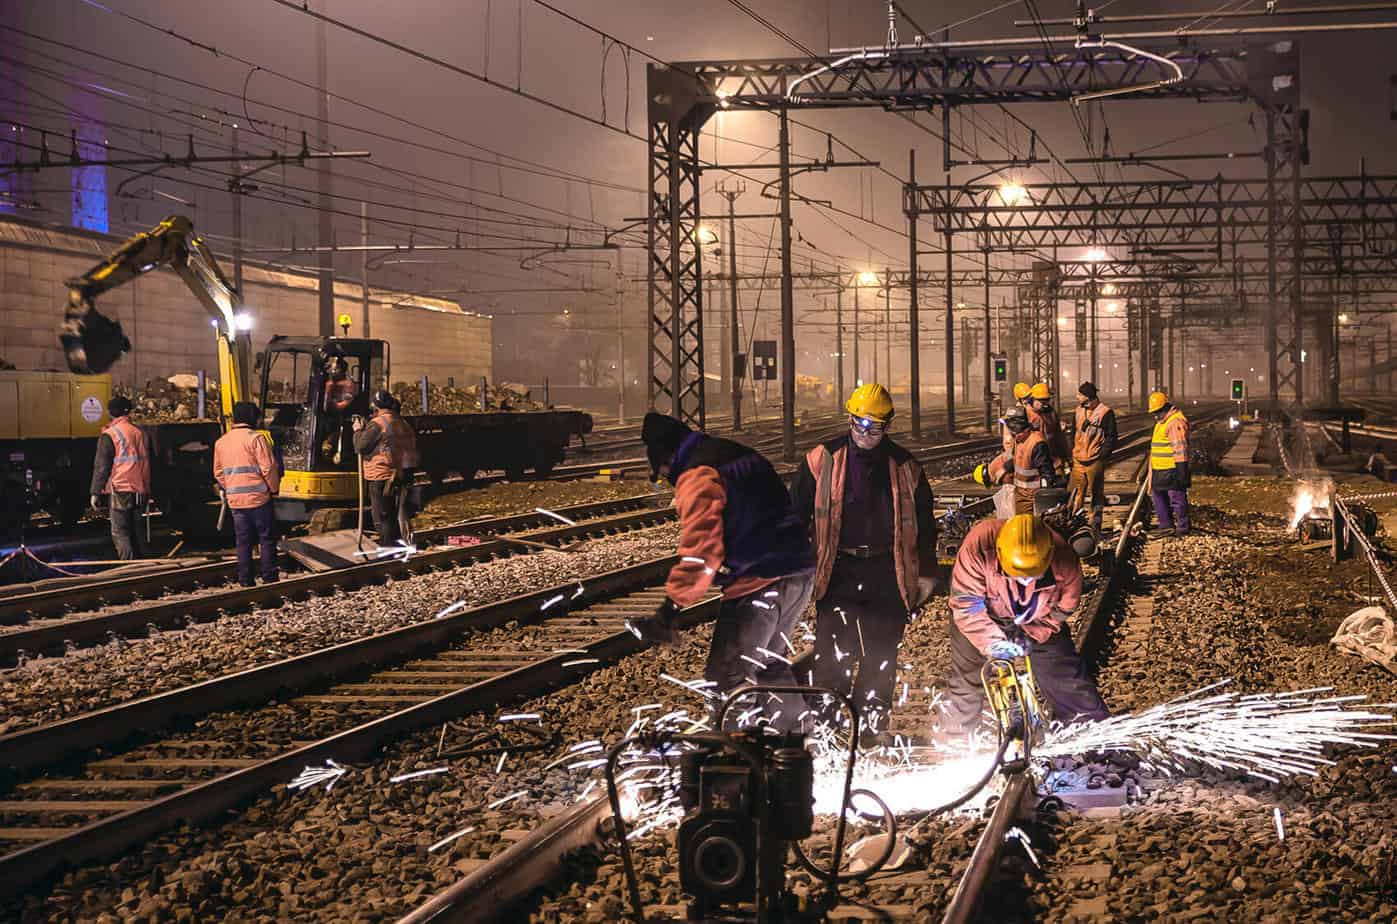 Lavorazioni in notturna in area RFI